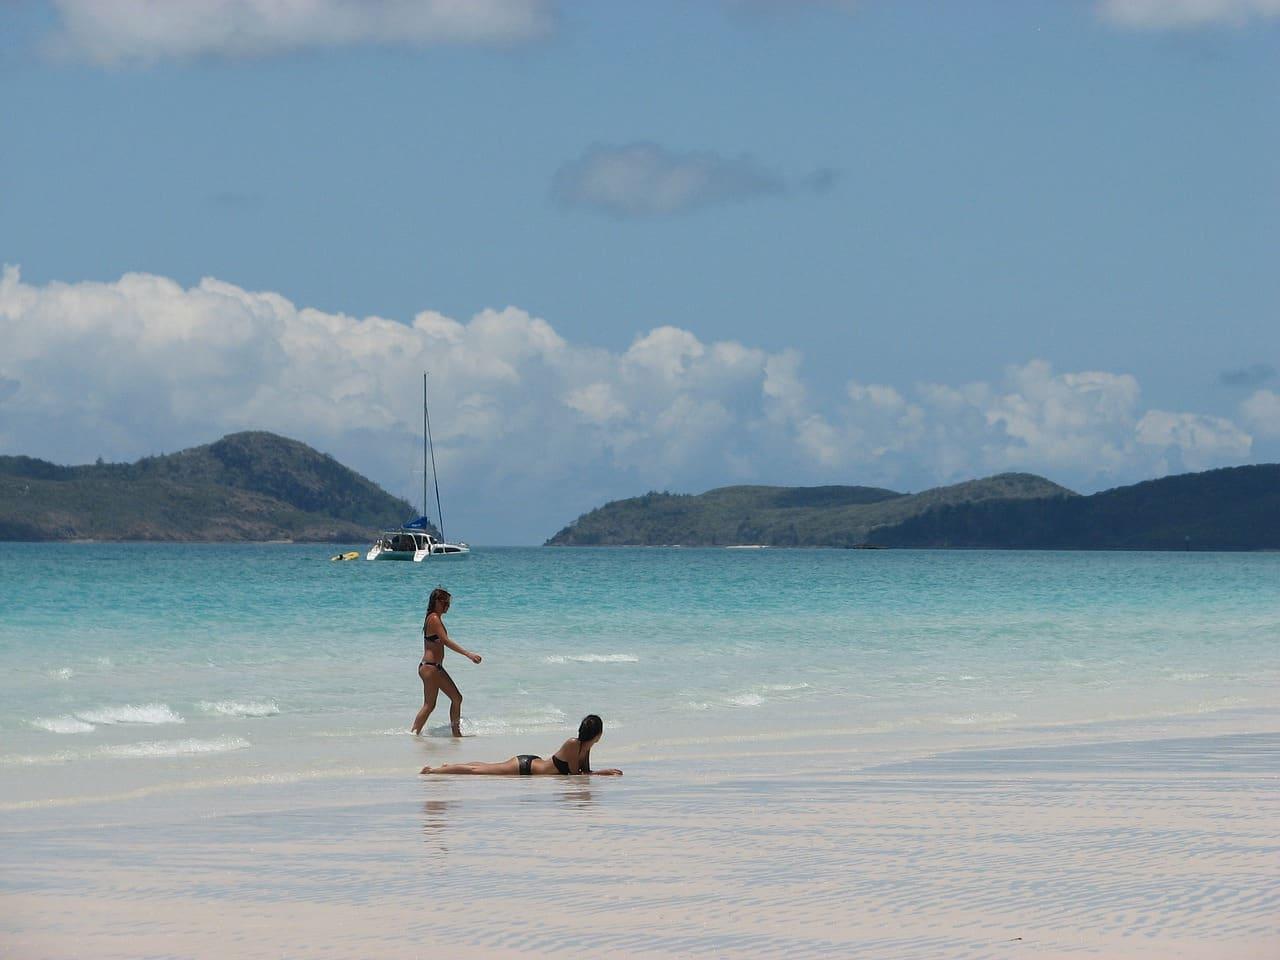 ilha de whitsundays